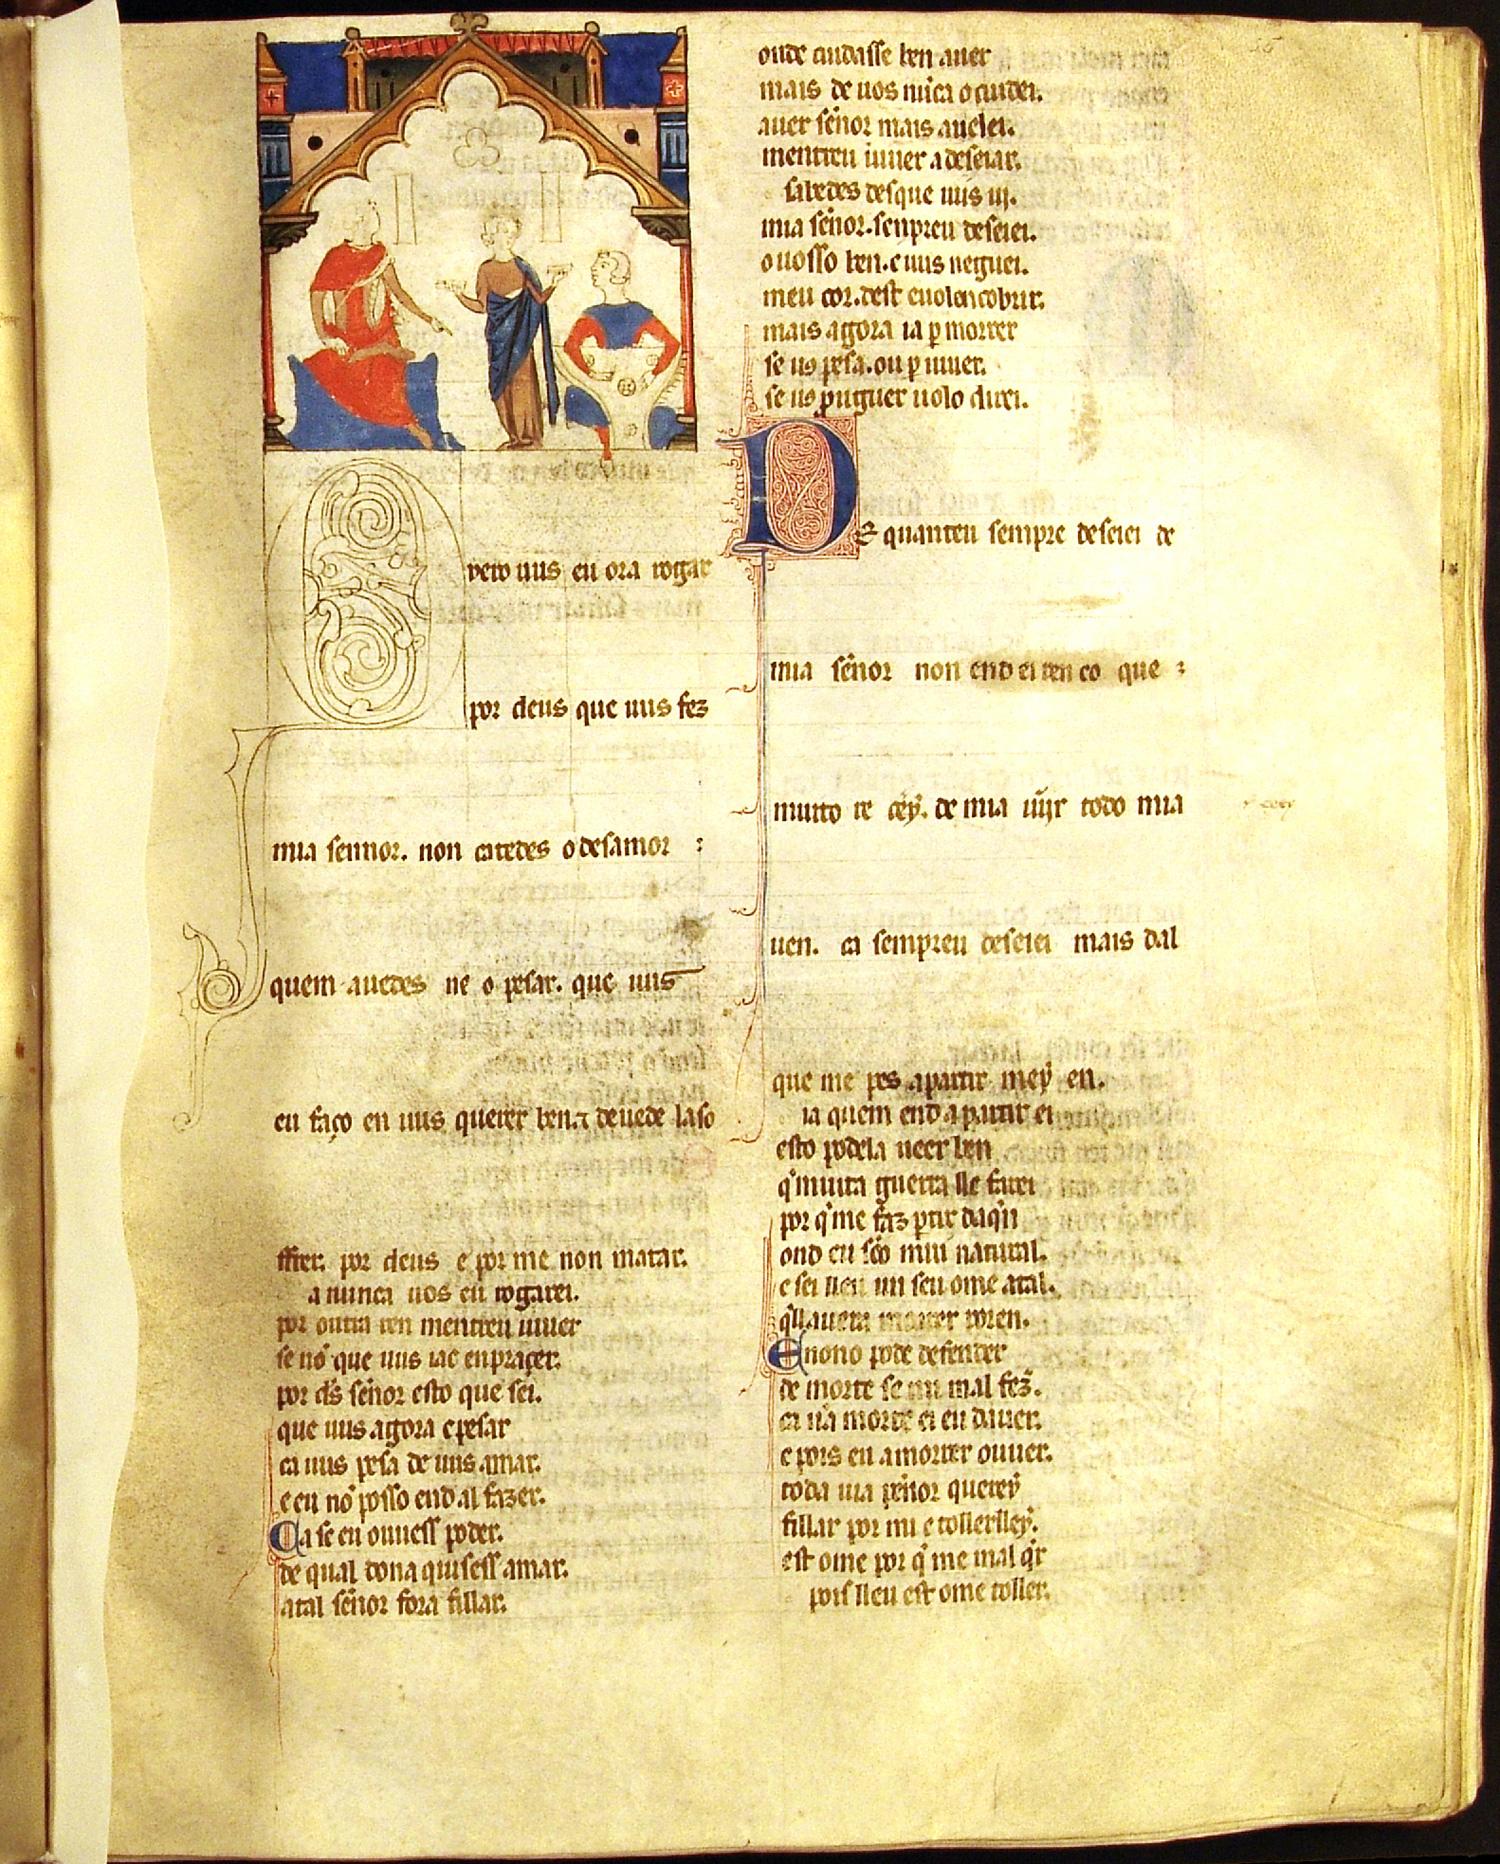 A 085 4 - Cultura literária medieval (3)